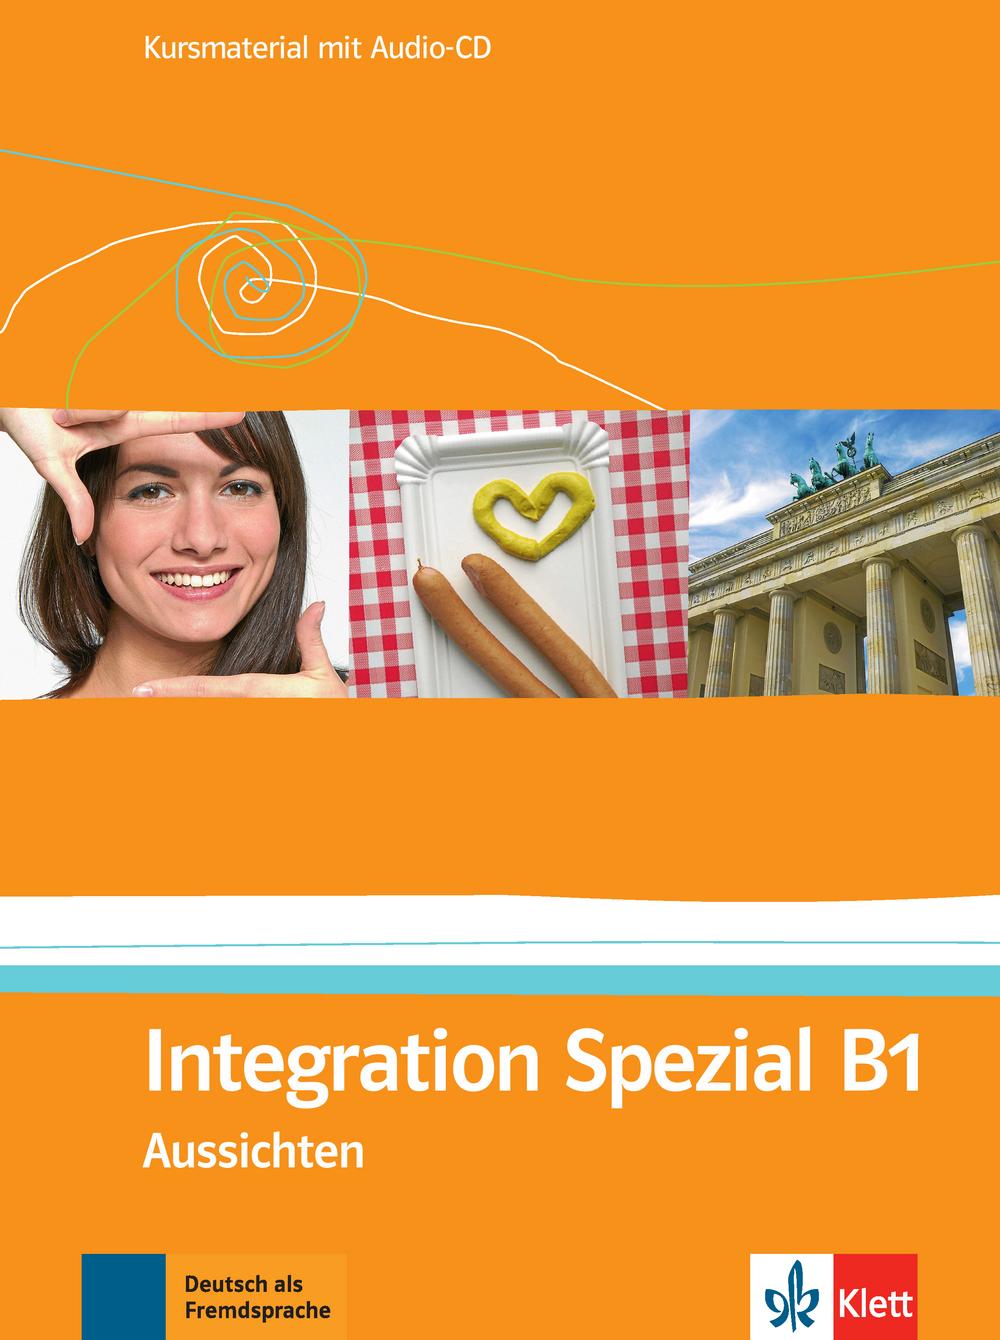 Integration Spezial B1